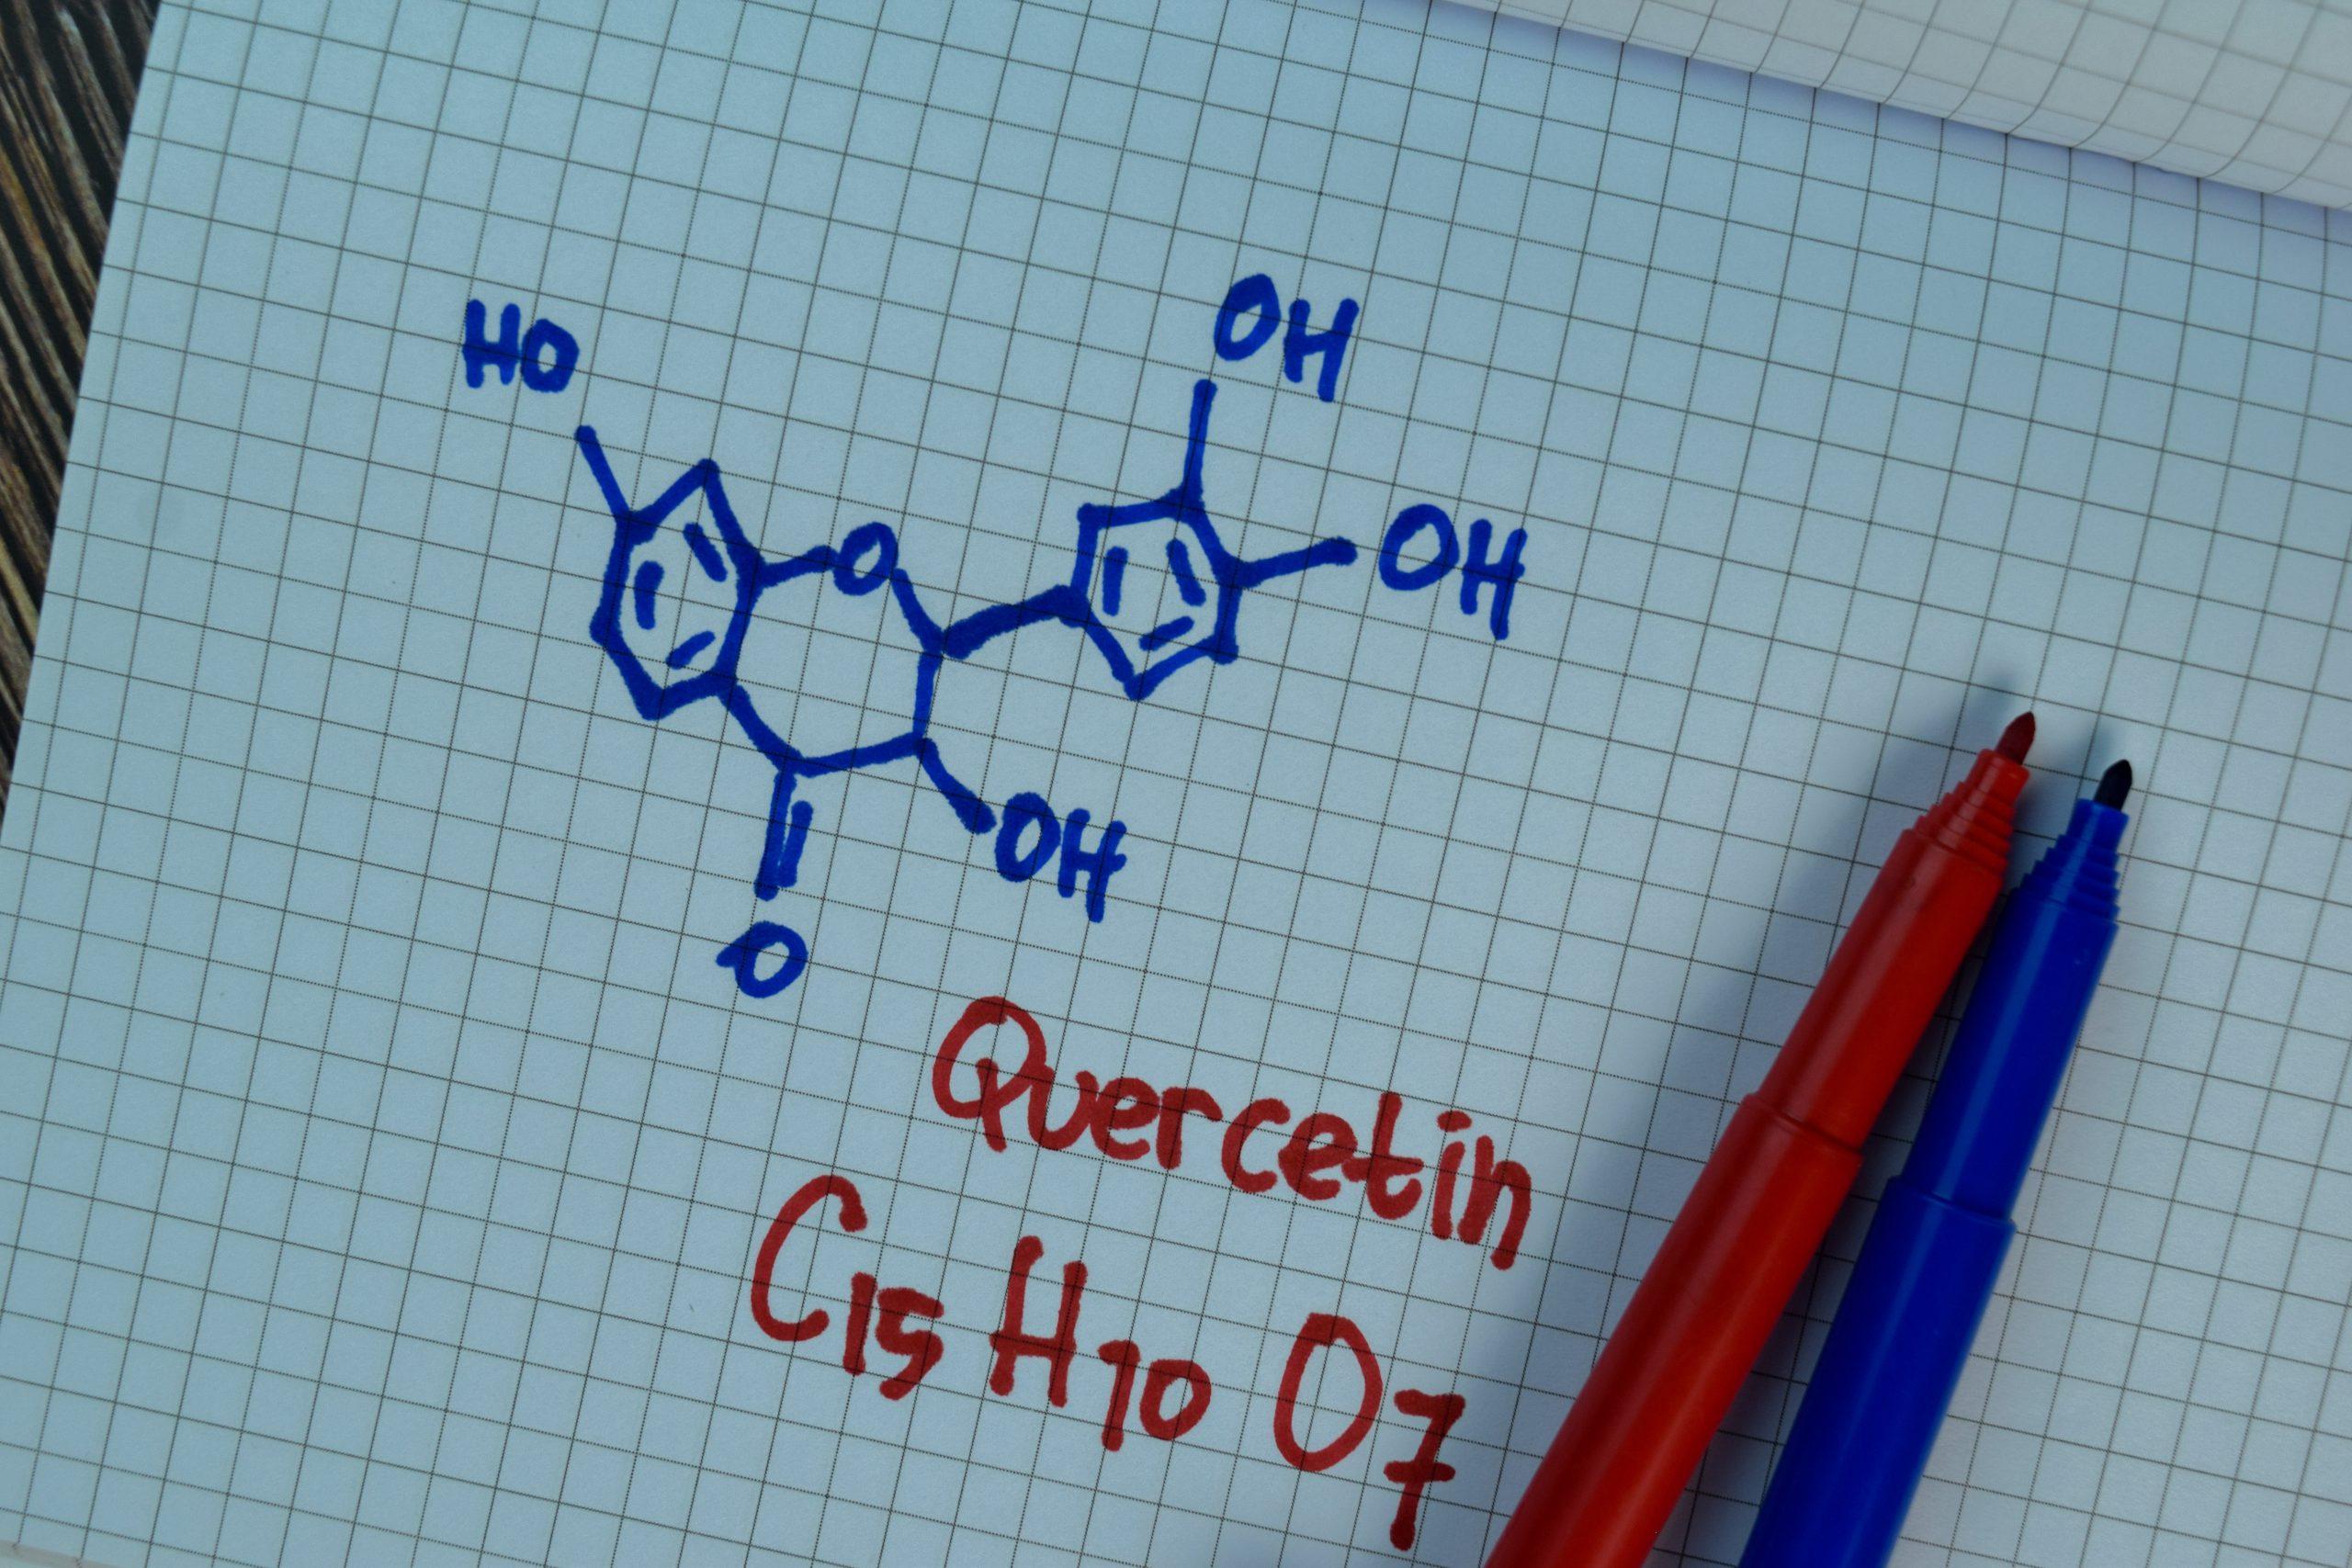 Quercetin, quercetin covid, quercetin benefits, what is quercetin